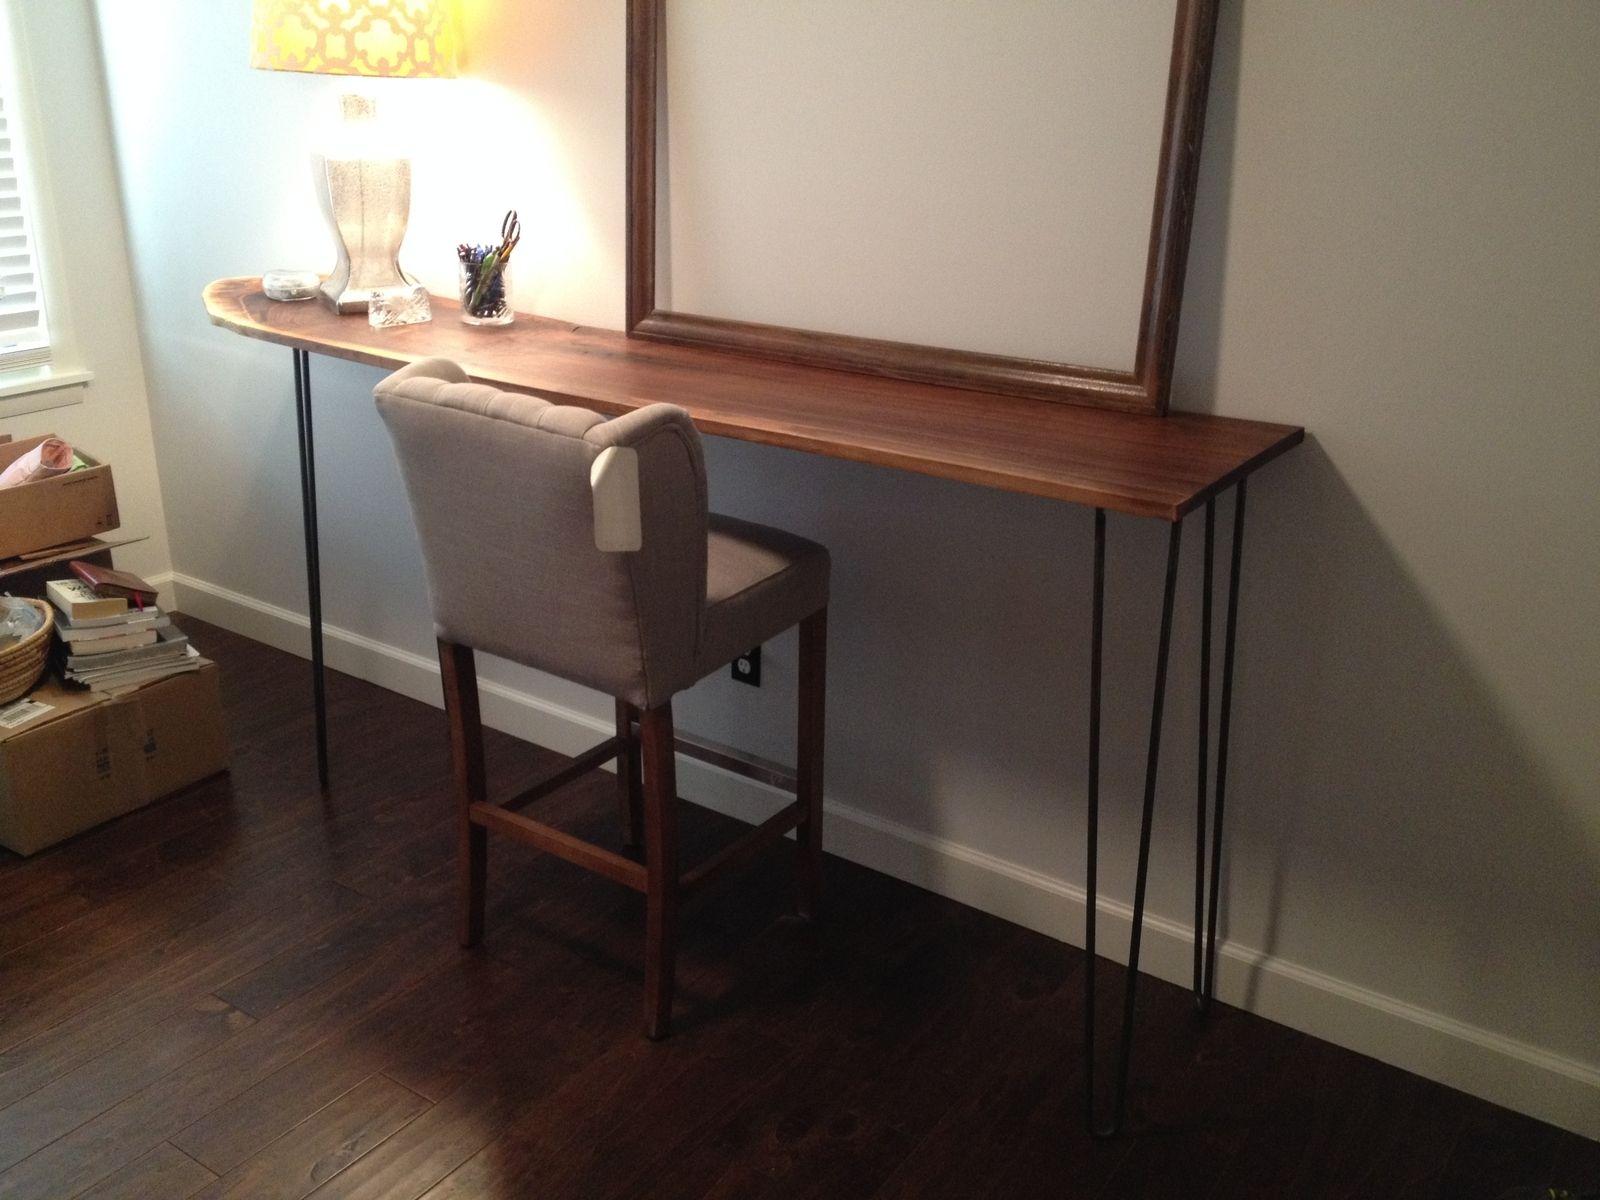 Custom Made Hairpin Leg Standing Desk by Gypsum Valley